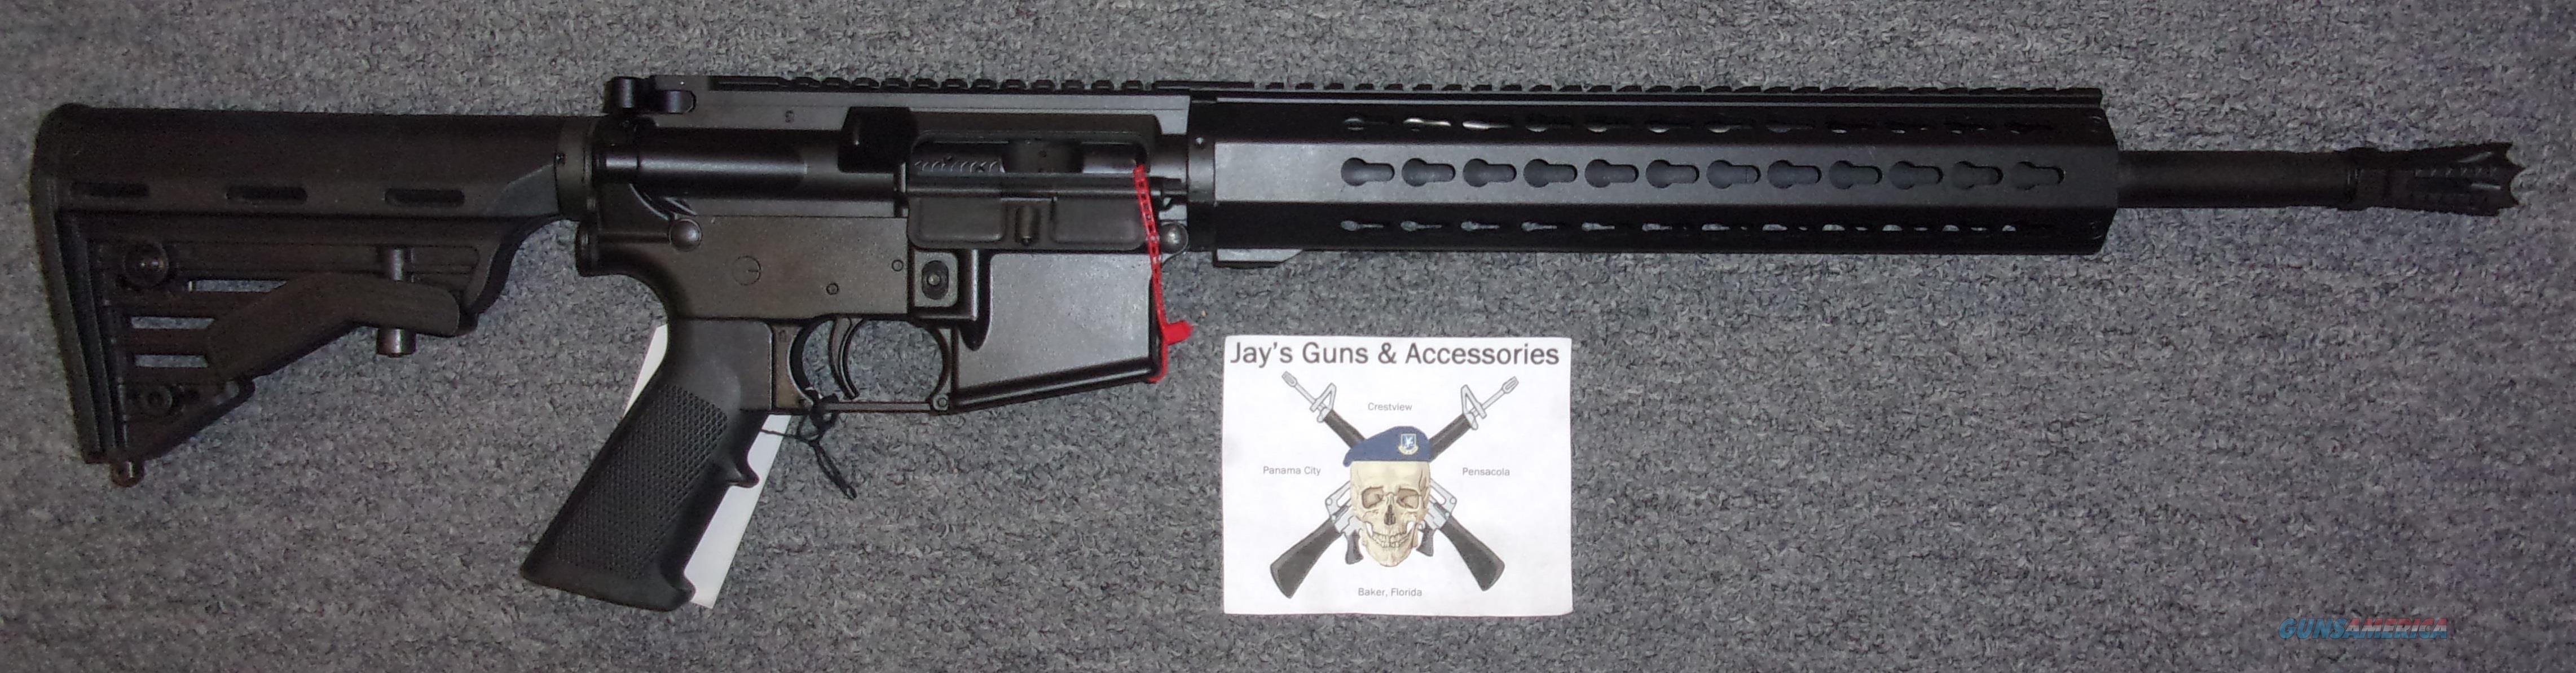 Anderson Mfg AM-15  Guns > Rifles > AR-15 Rifles - Small Manufacturers > Complete Rifle